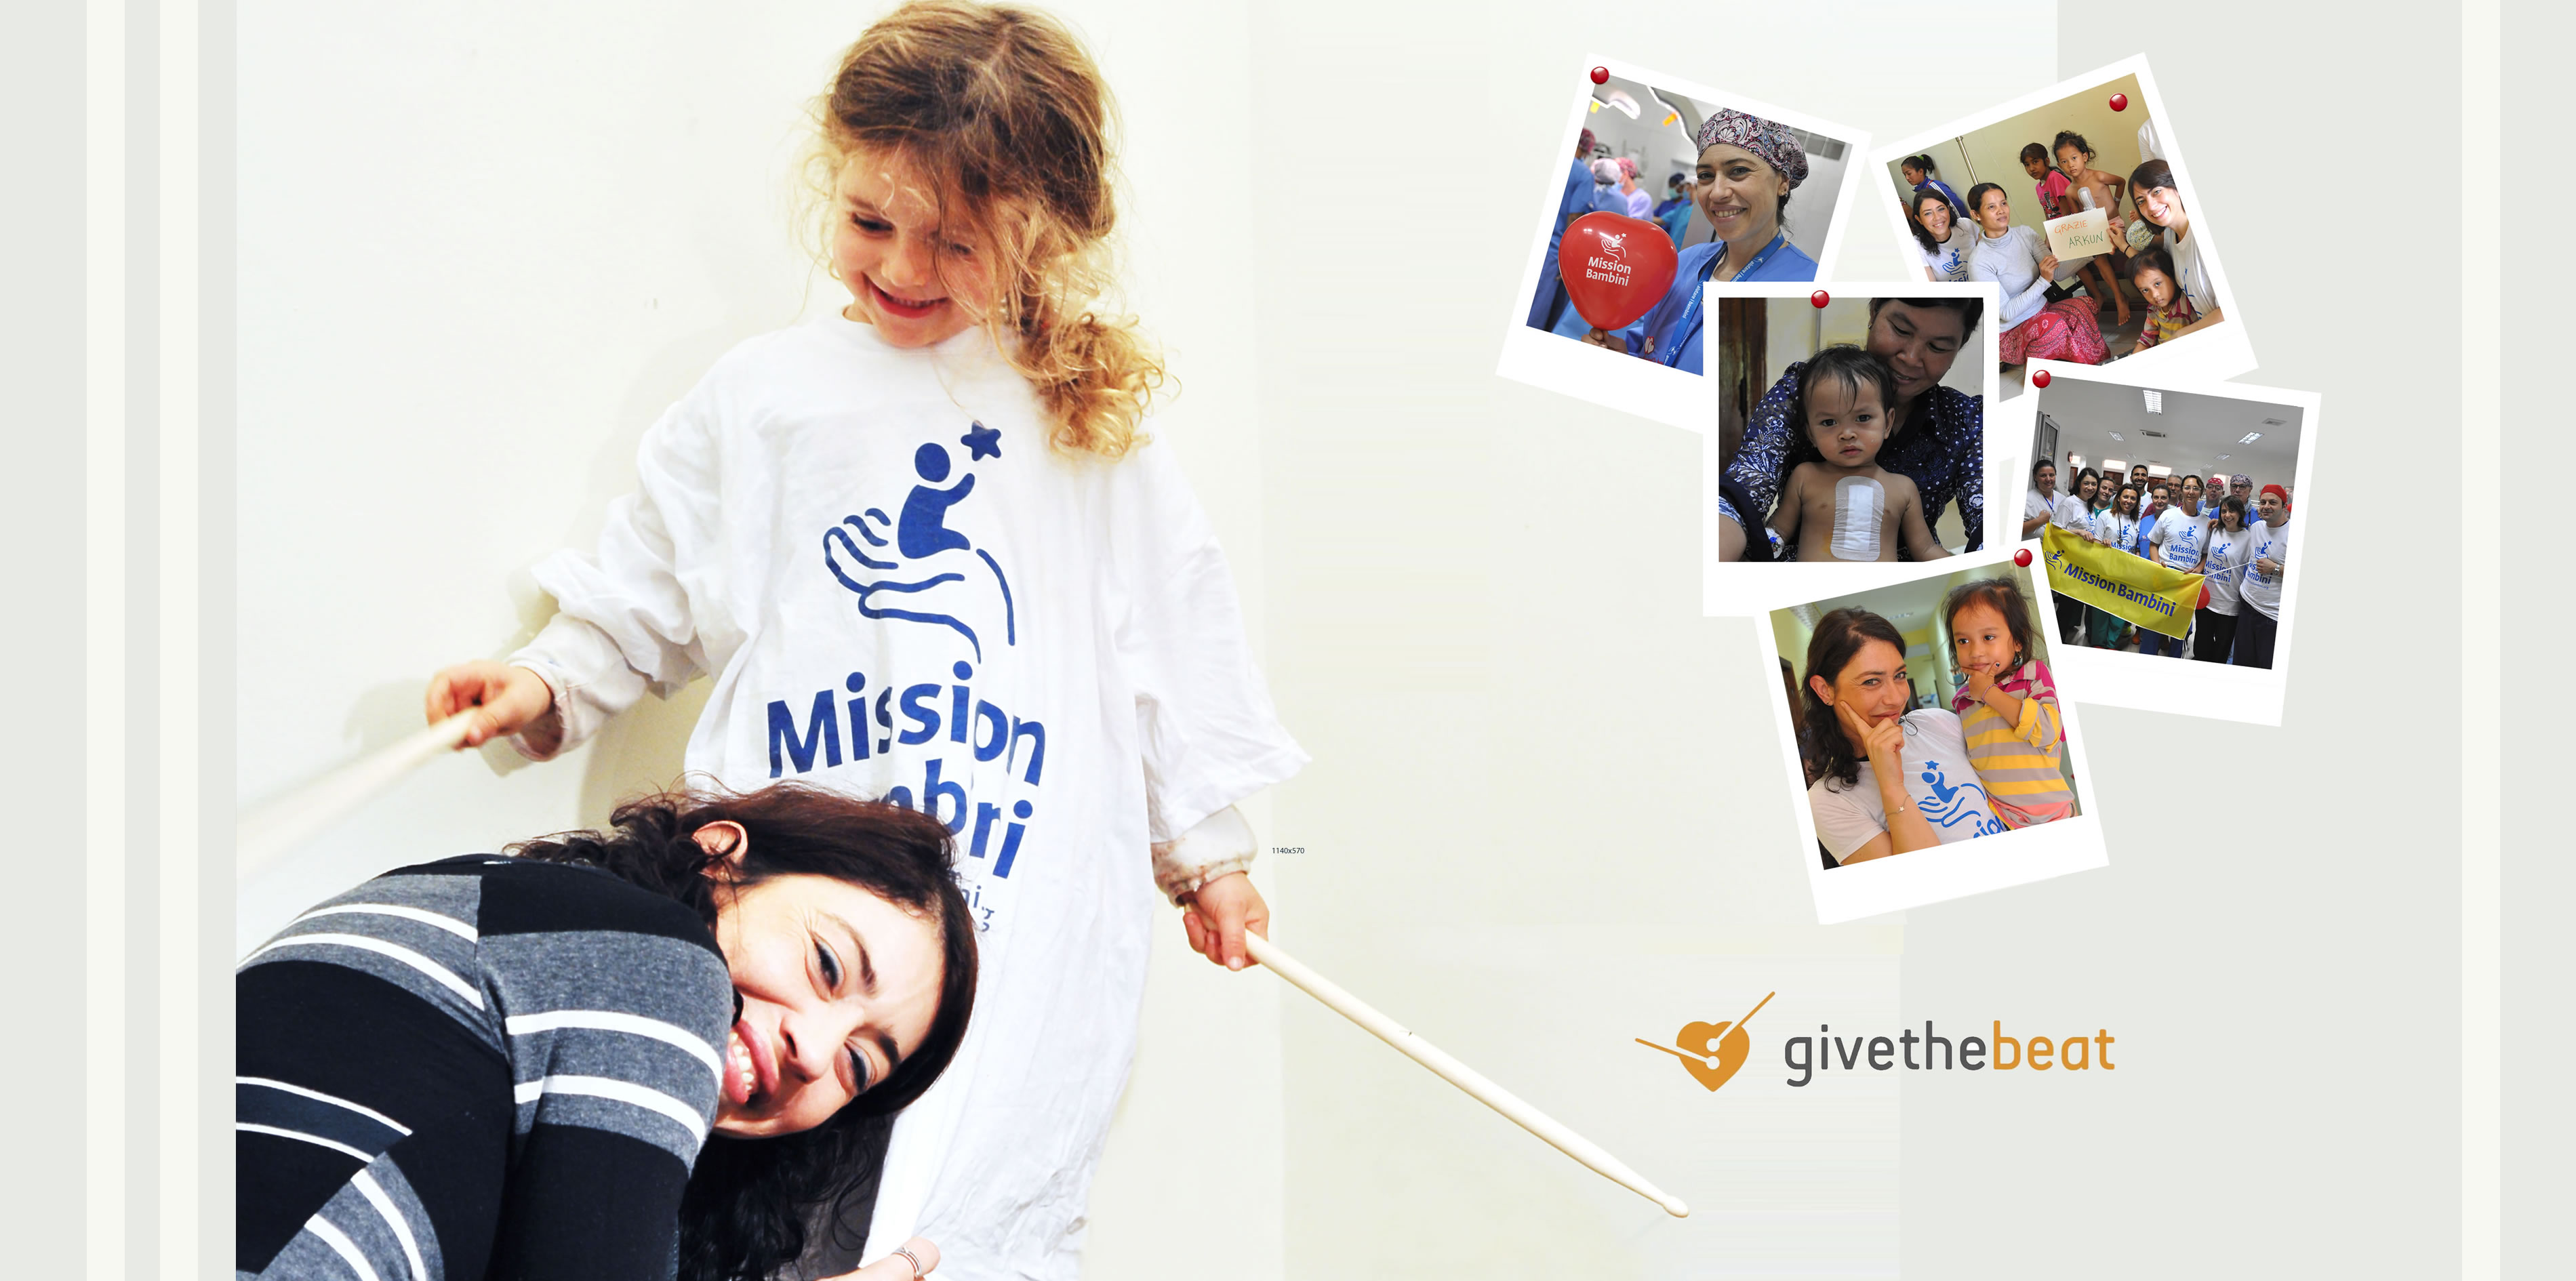 #GivetheBeat! Raffaella Fuso-Raffaella Fuso